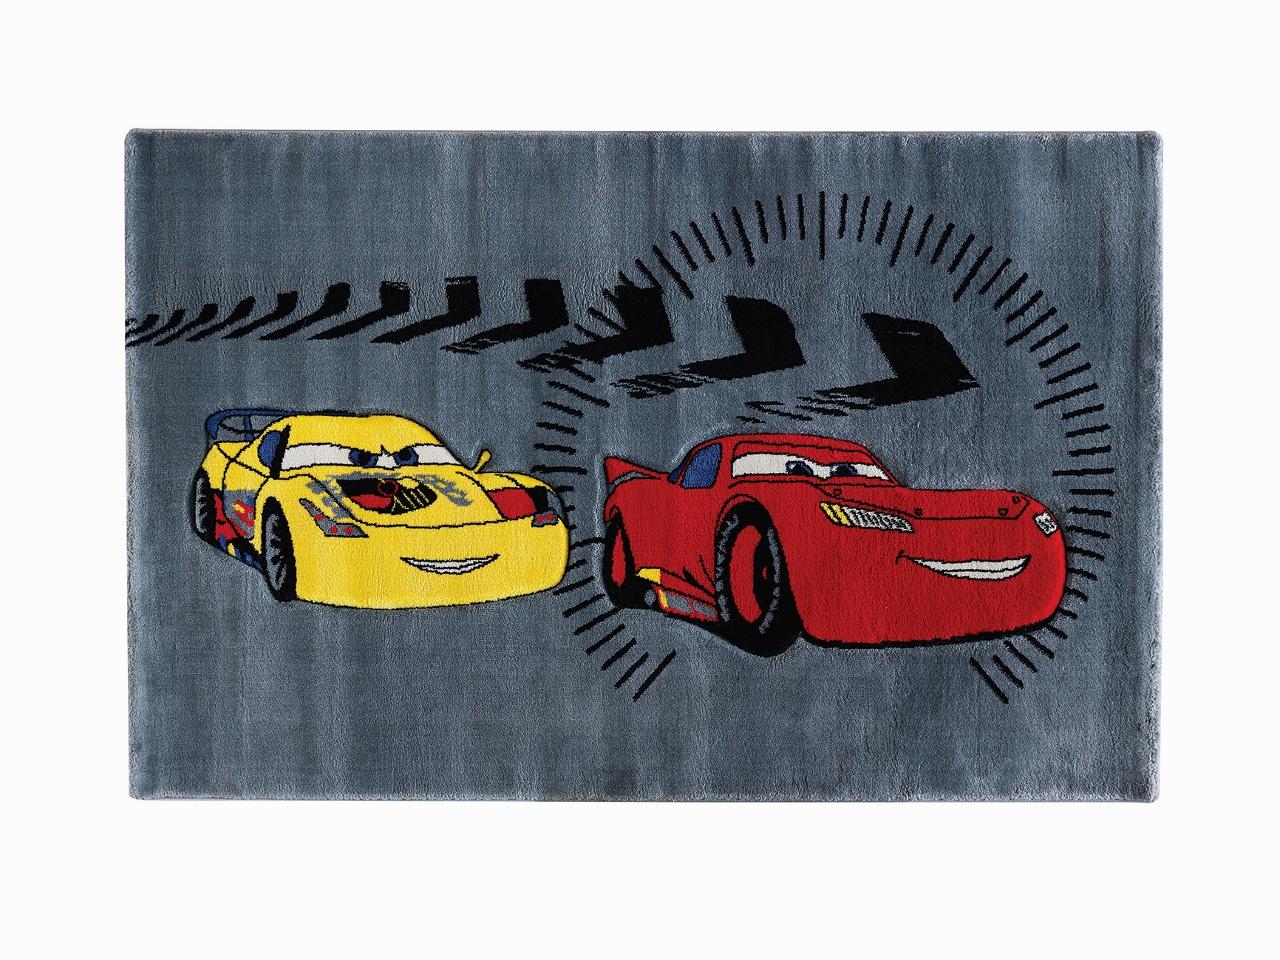 Titi Teppich Kinderzimmer Racer Speed Police